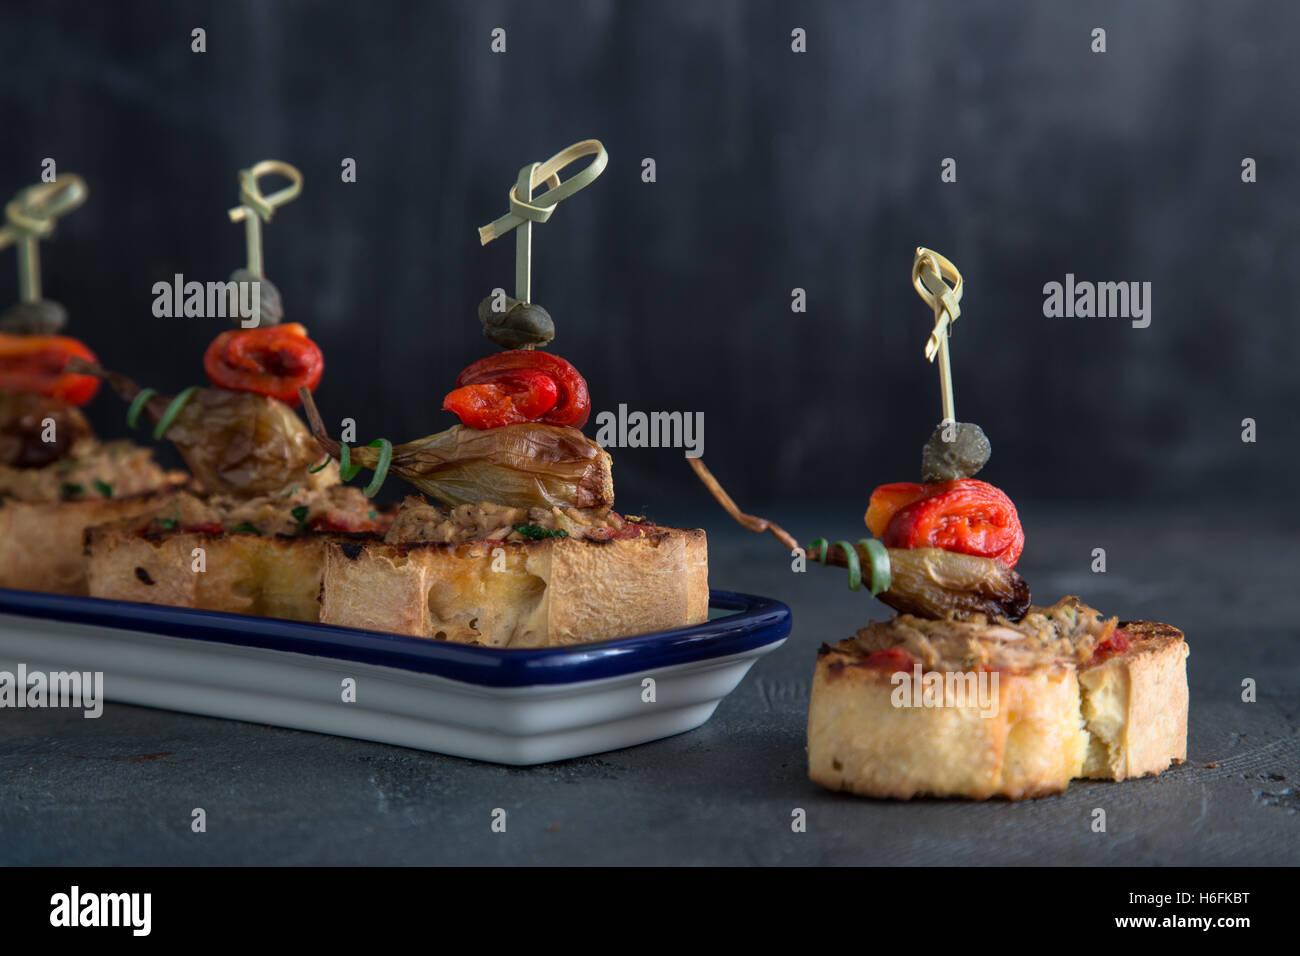 Pintxos Tapa on traditional plate, crispy bread, tuna, onion and pepper. - Stock Image